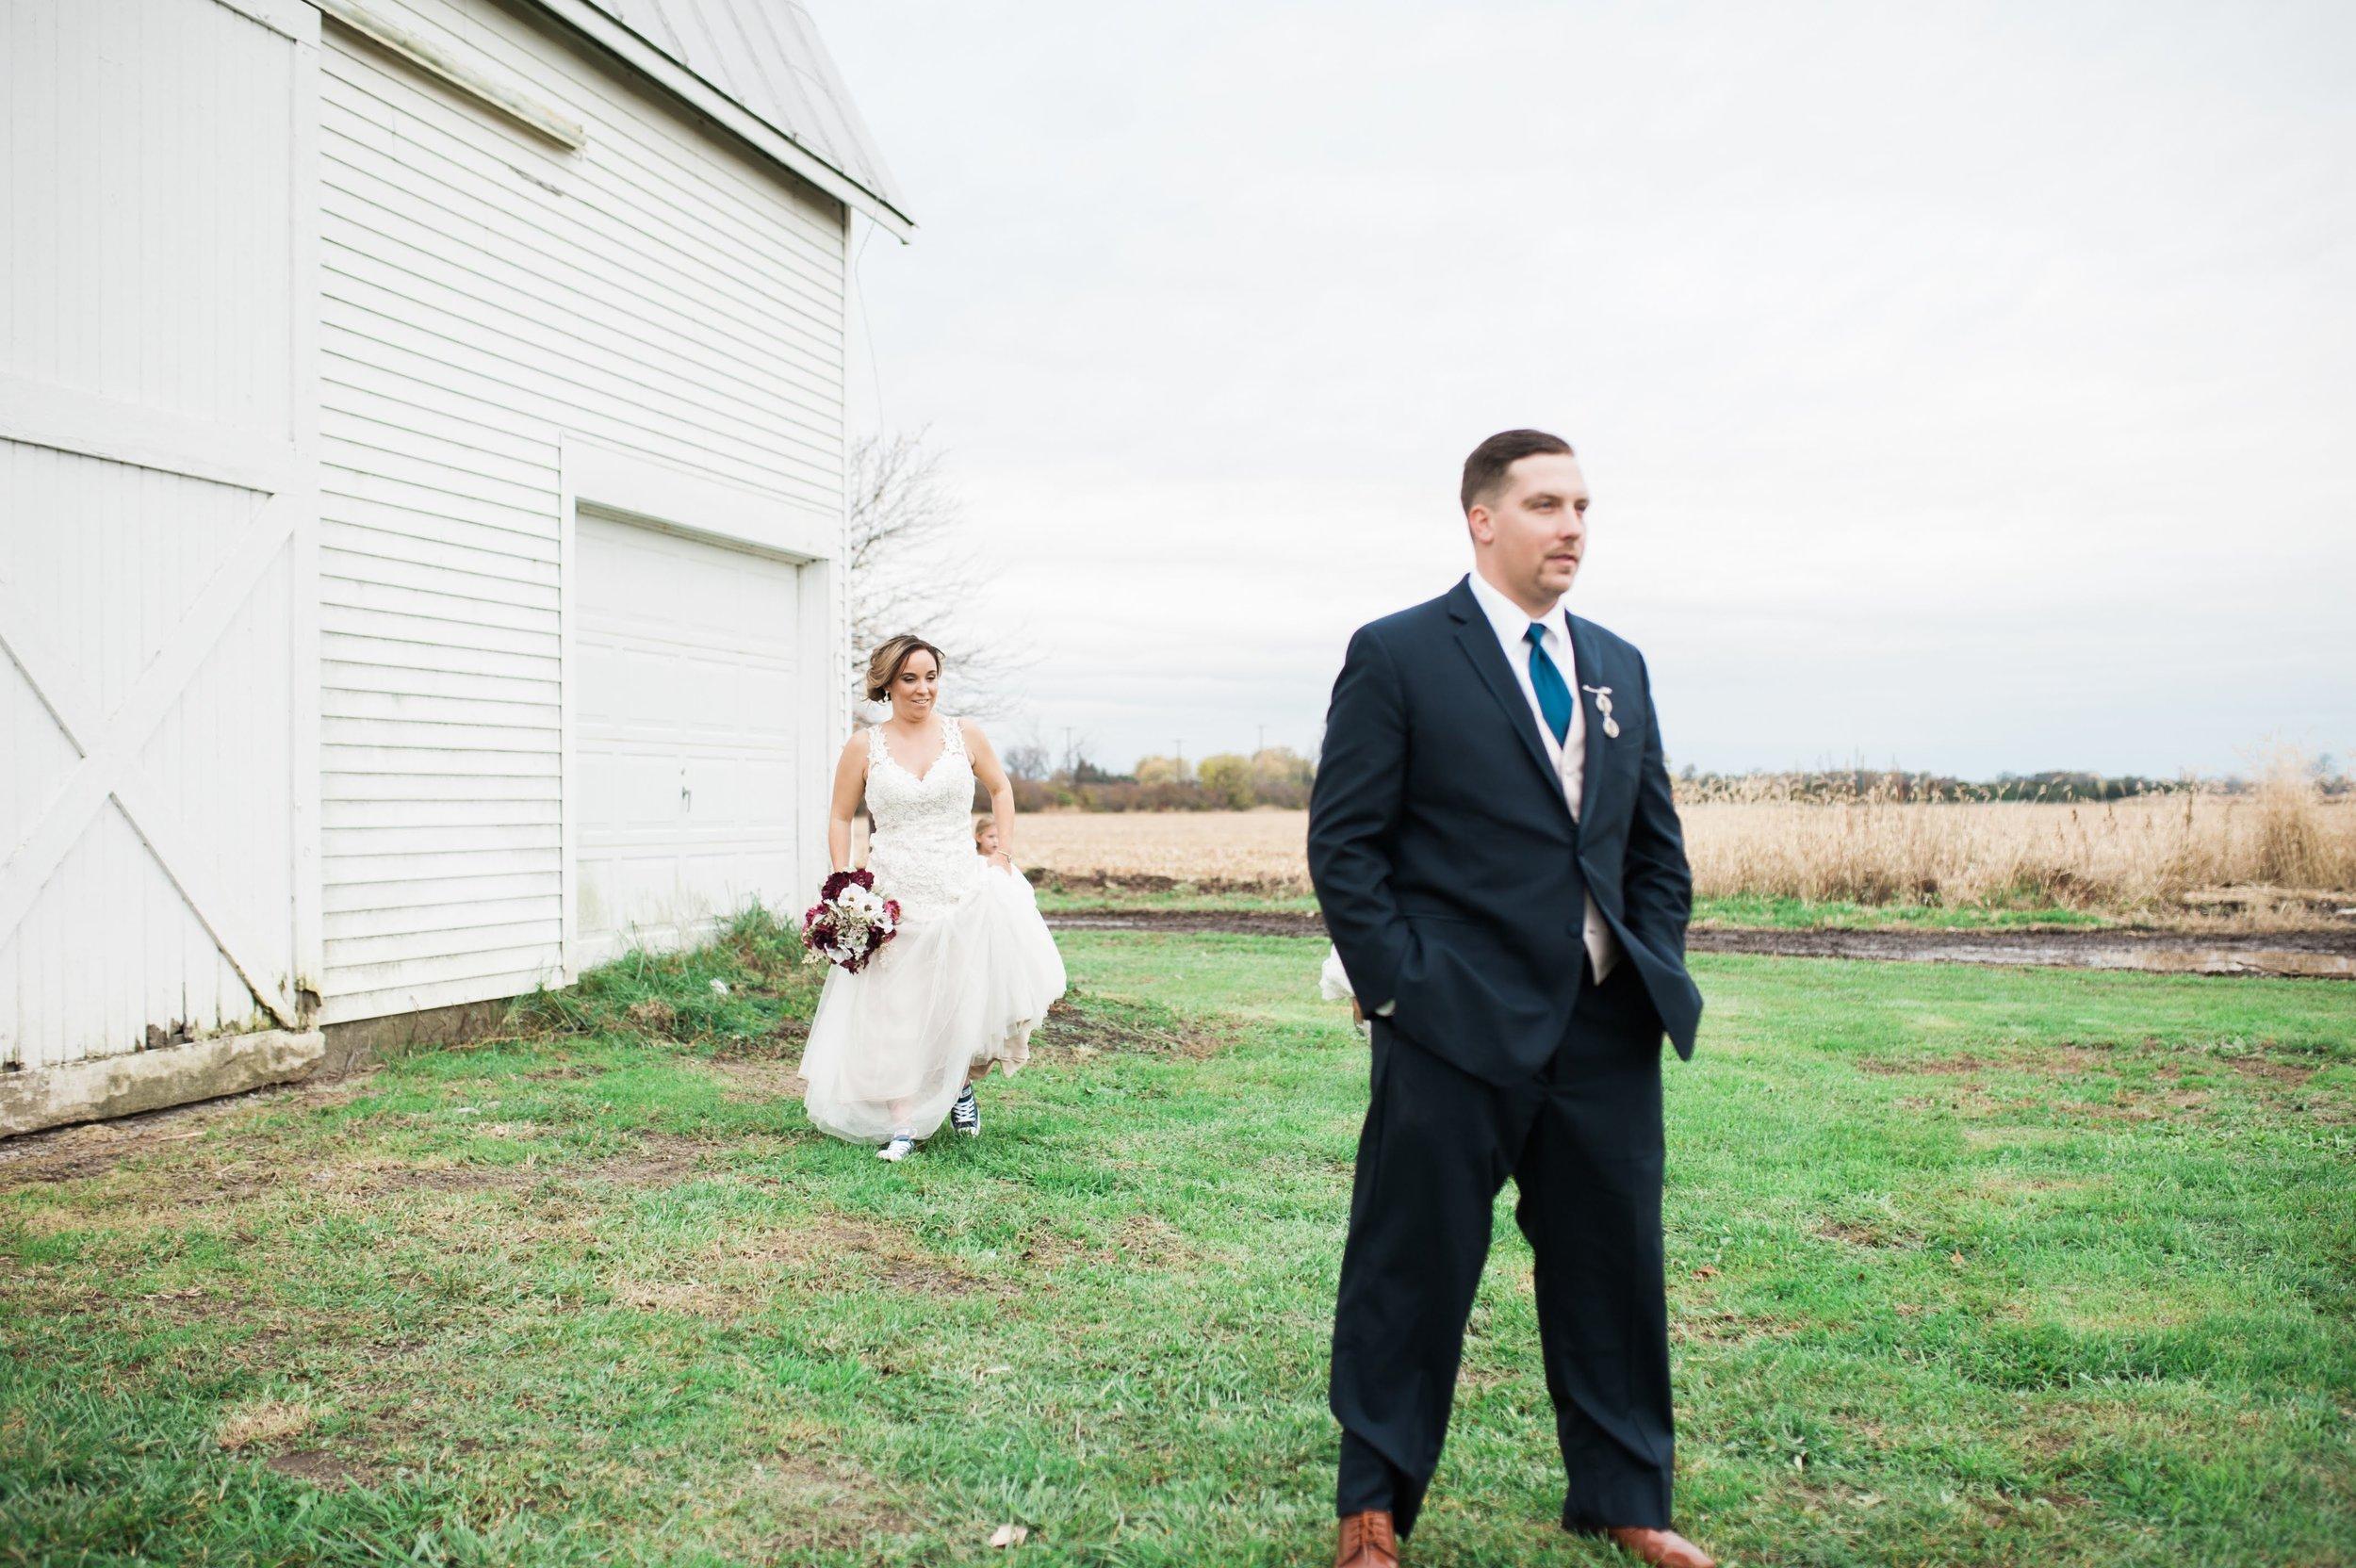 LLP Michigan Wedding Photographer 12.jpg